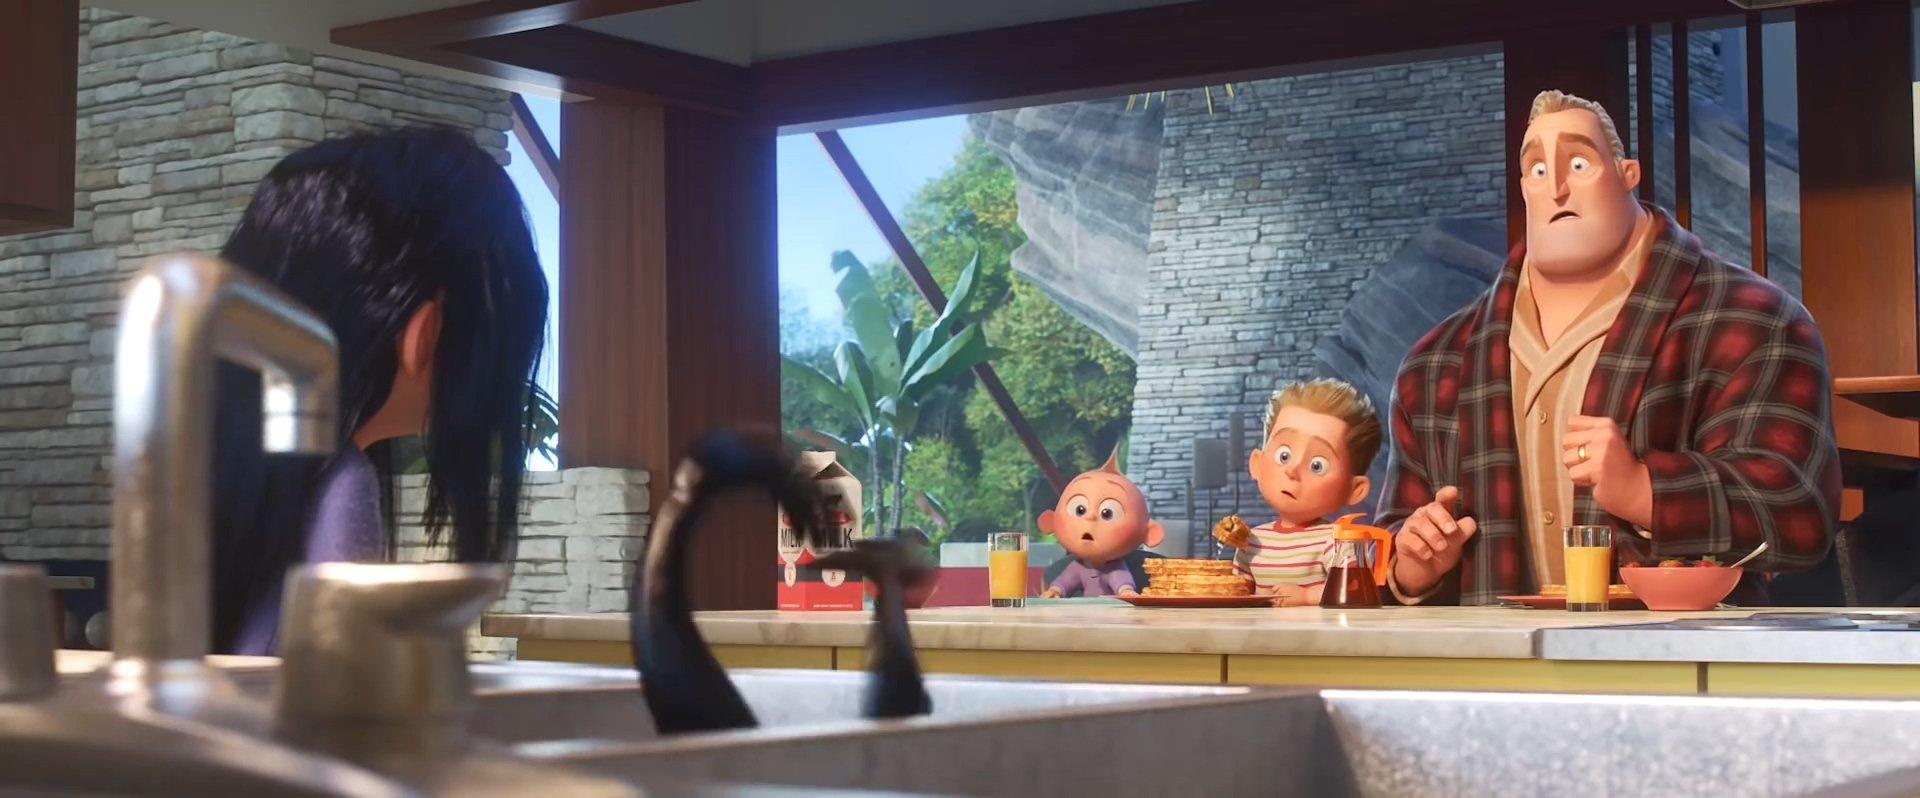 Incredibles 2 Official Trailer_116.328.jpg